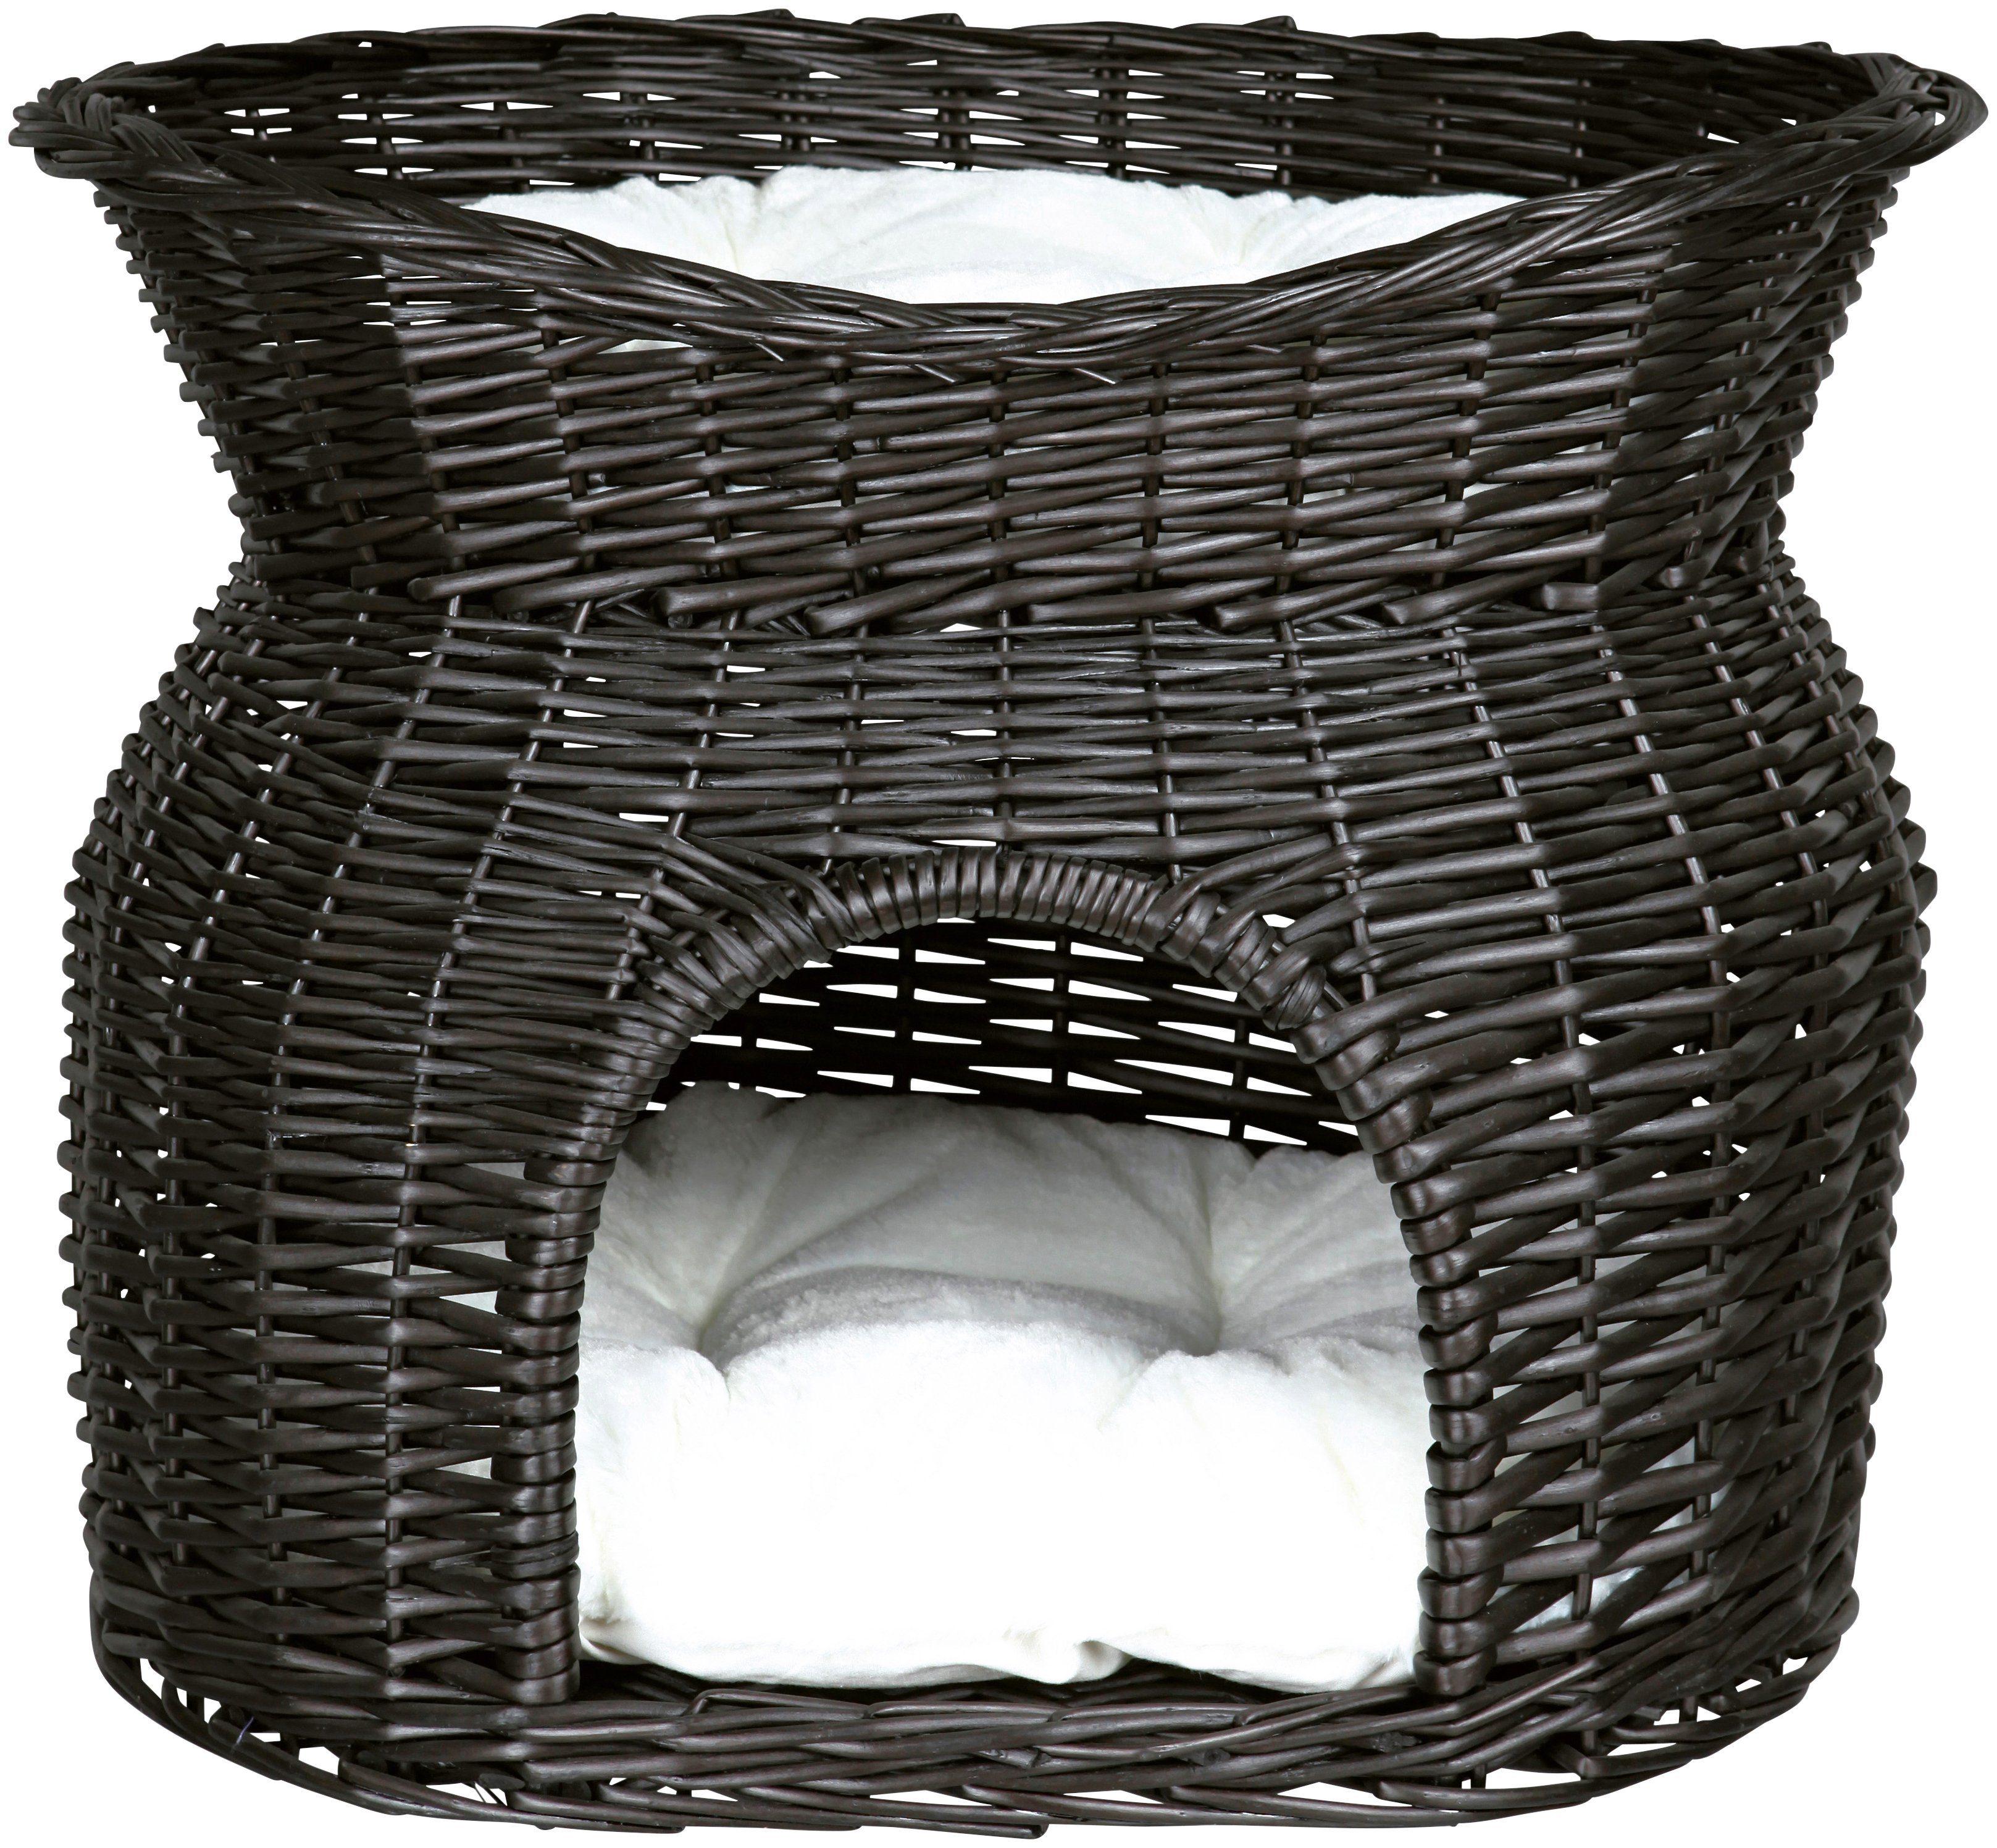 TRIXIE Katzen-Korbturm , B/L/H: 54/43/37 cm, schwarz